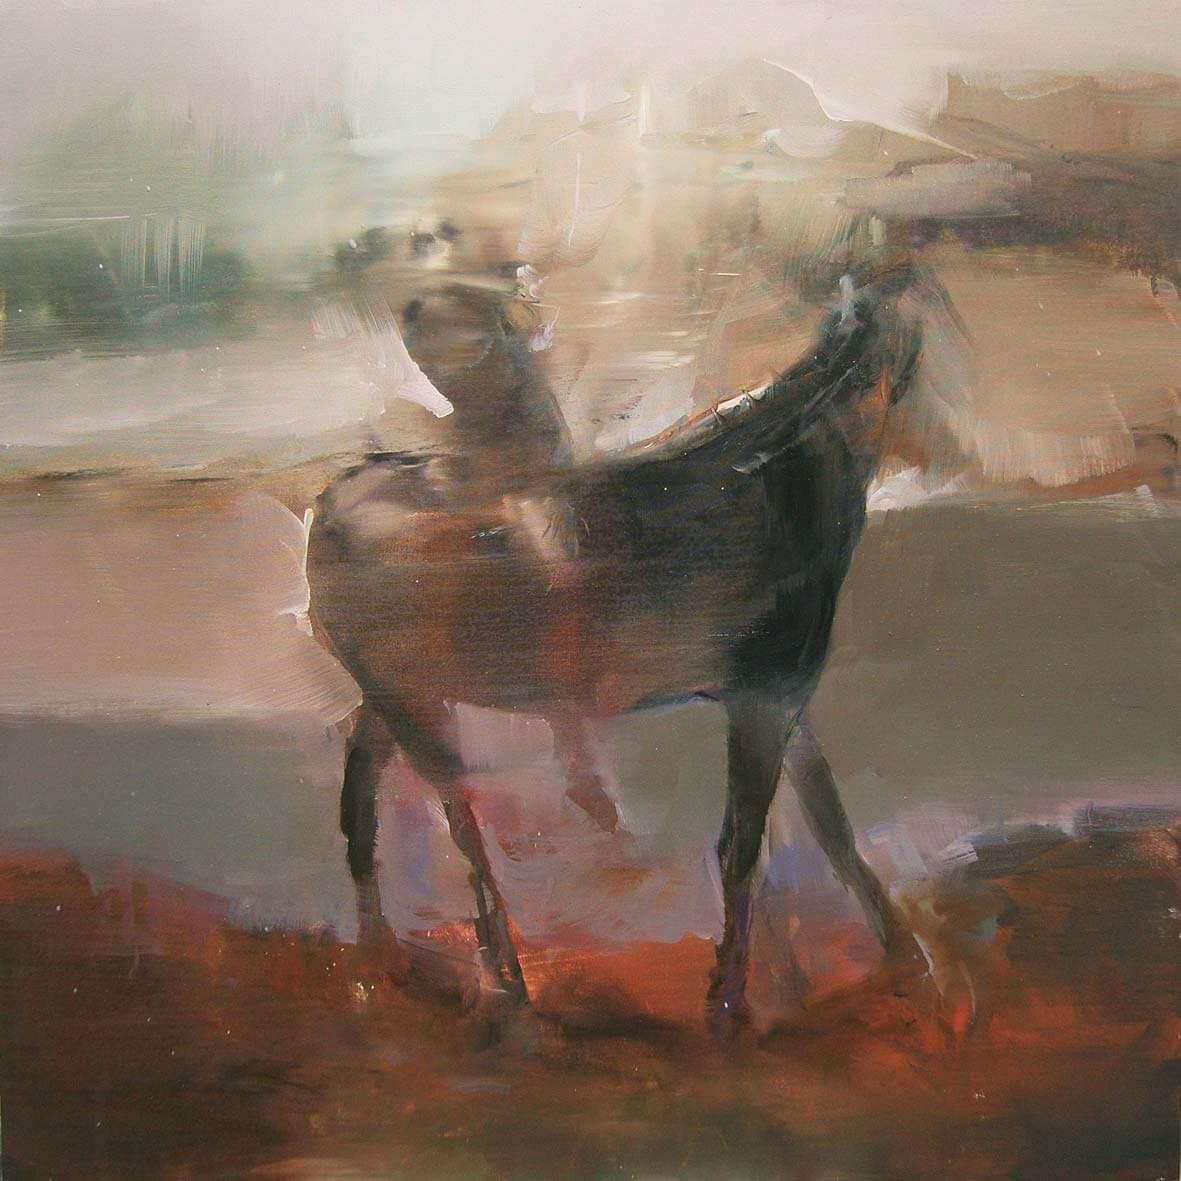 Paul of Tarsus falls asleep and dreams IV, 2016, olio su tela, 60x60 cm